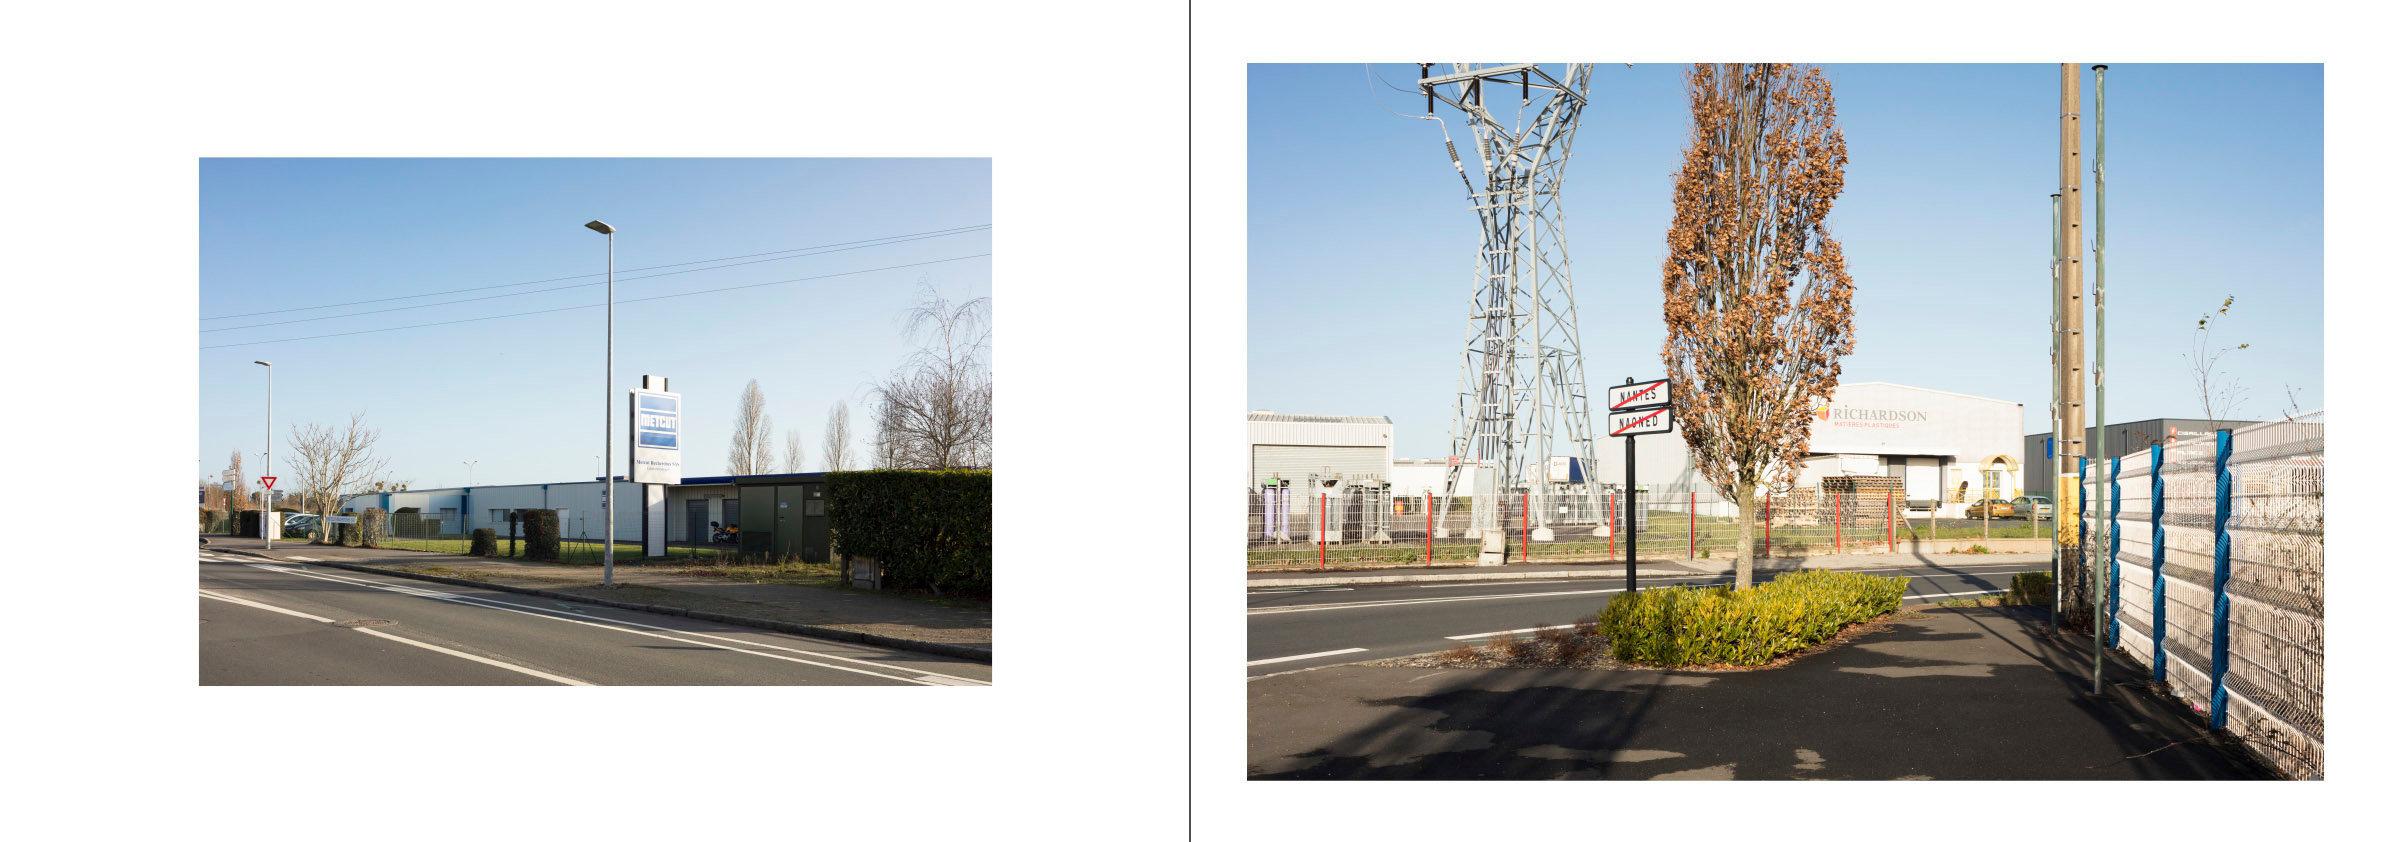 Nantes-Carquefou-Ste Luce A3-page025.jpeg